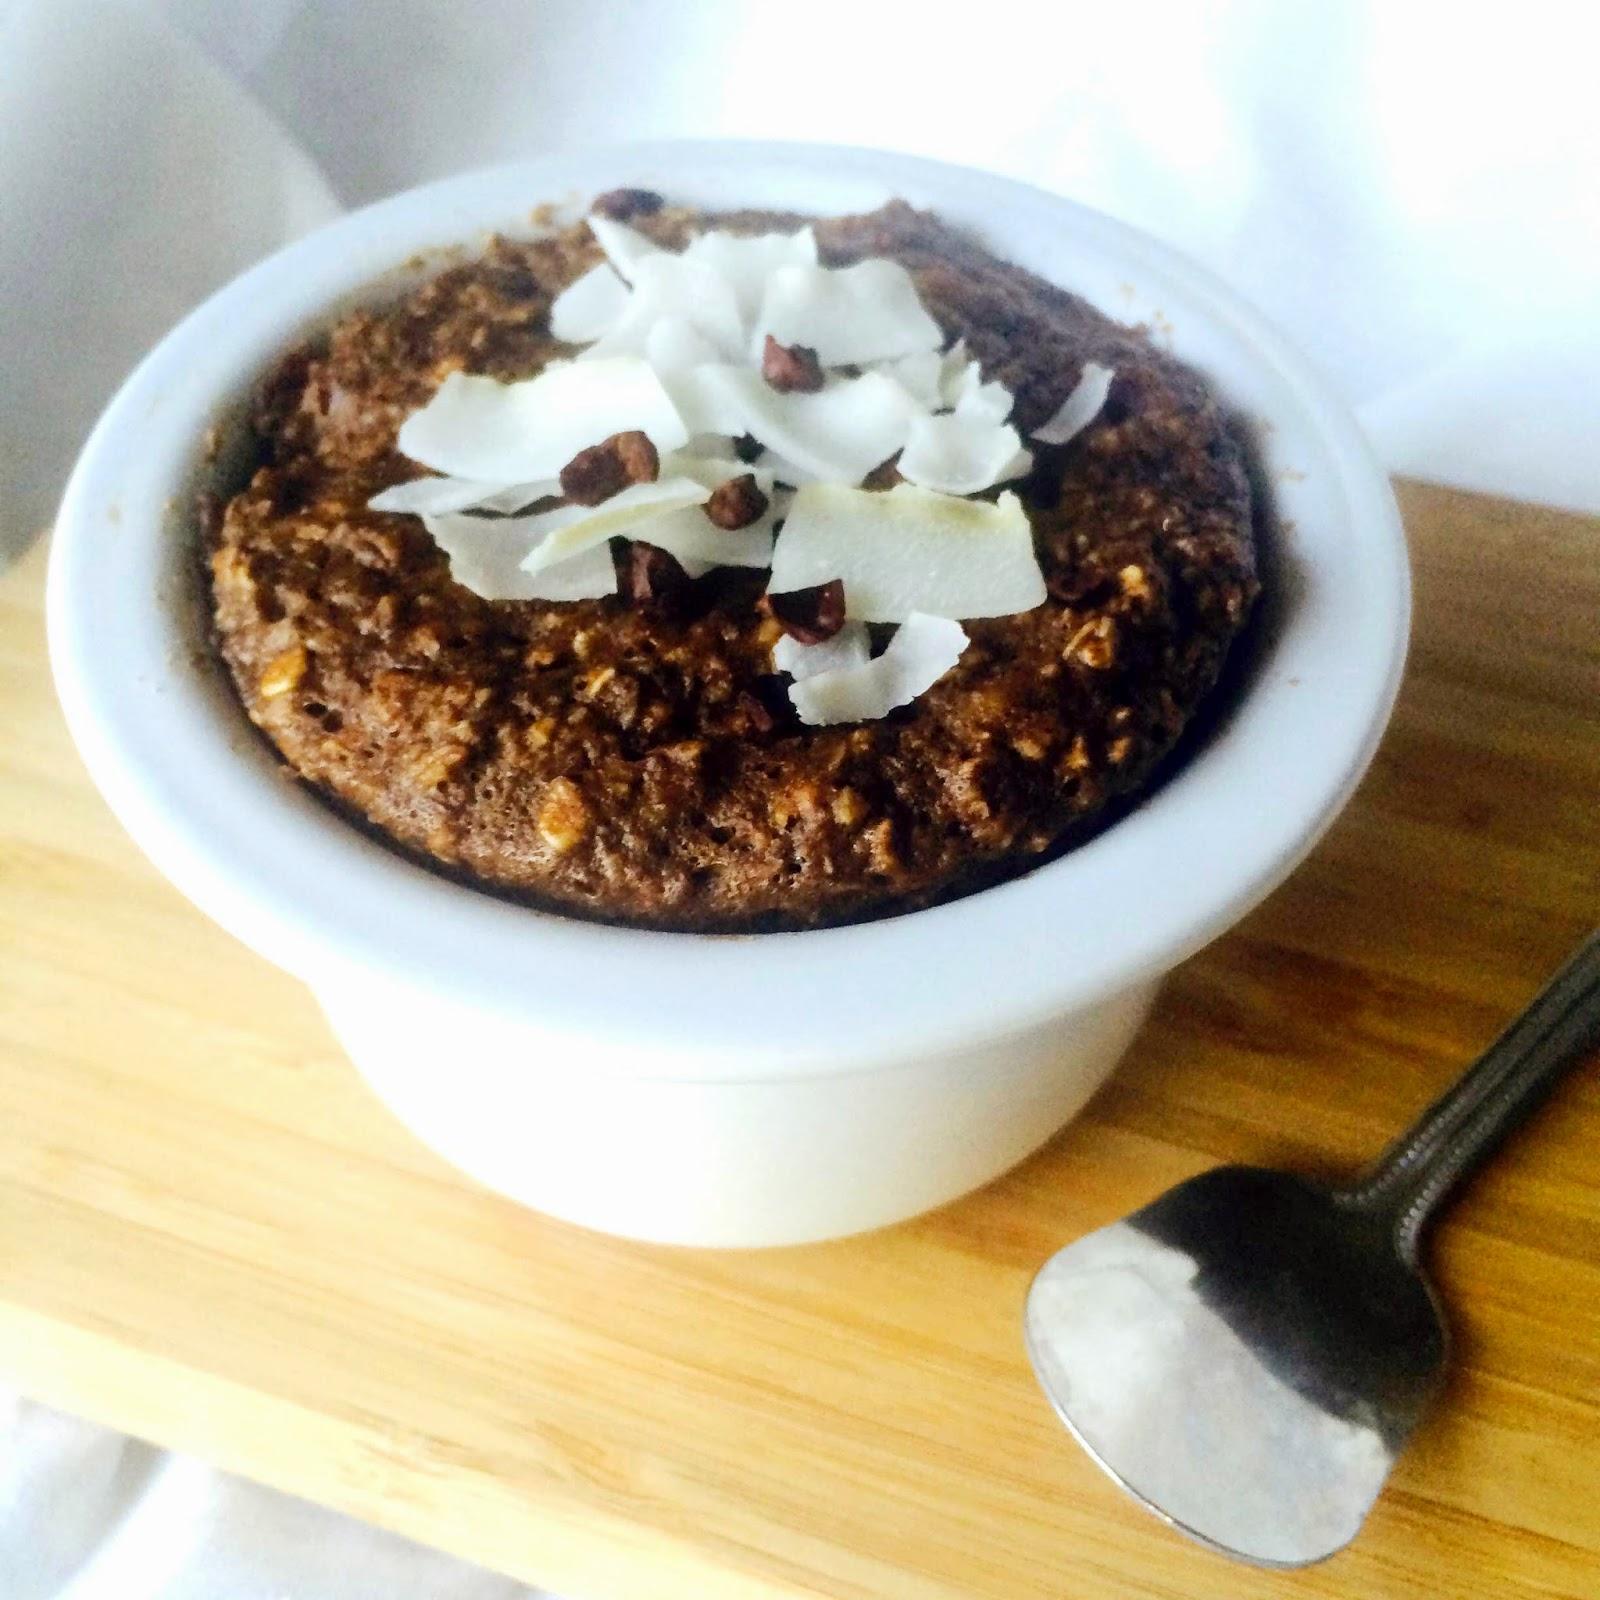 Microwave Baked Chocolate Mini Cake Recipe